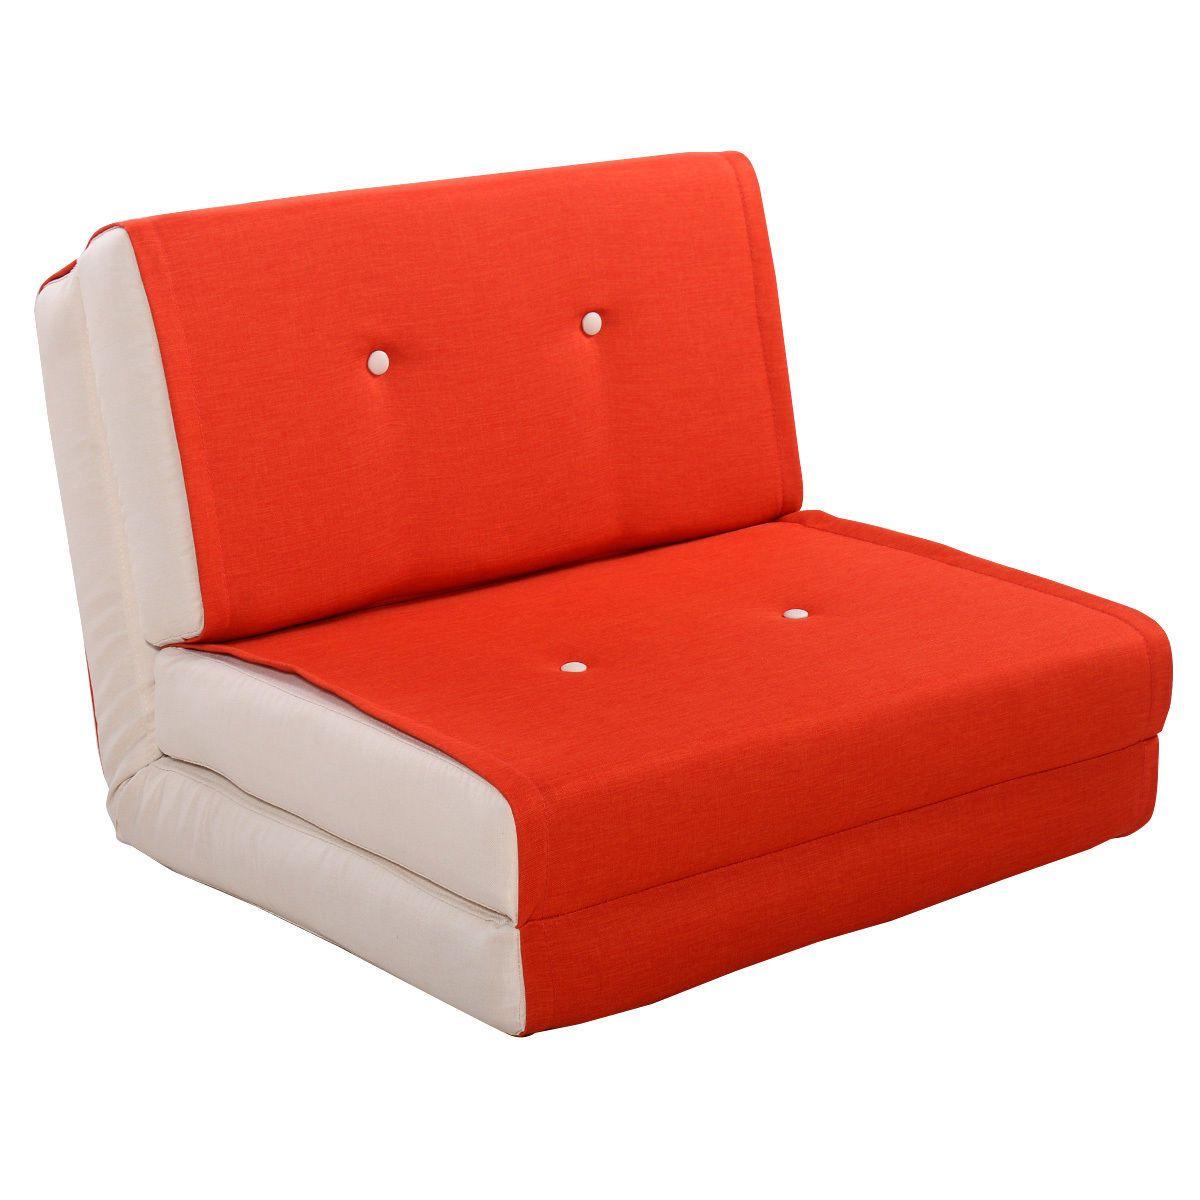 Convertible Folding Sofa Bed